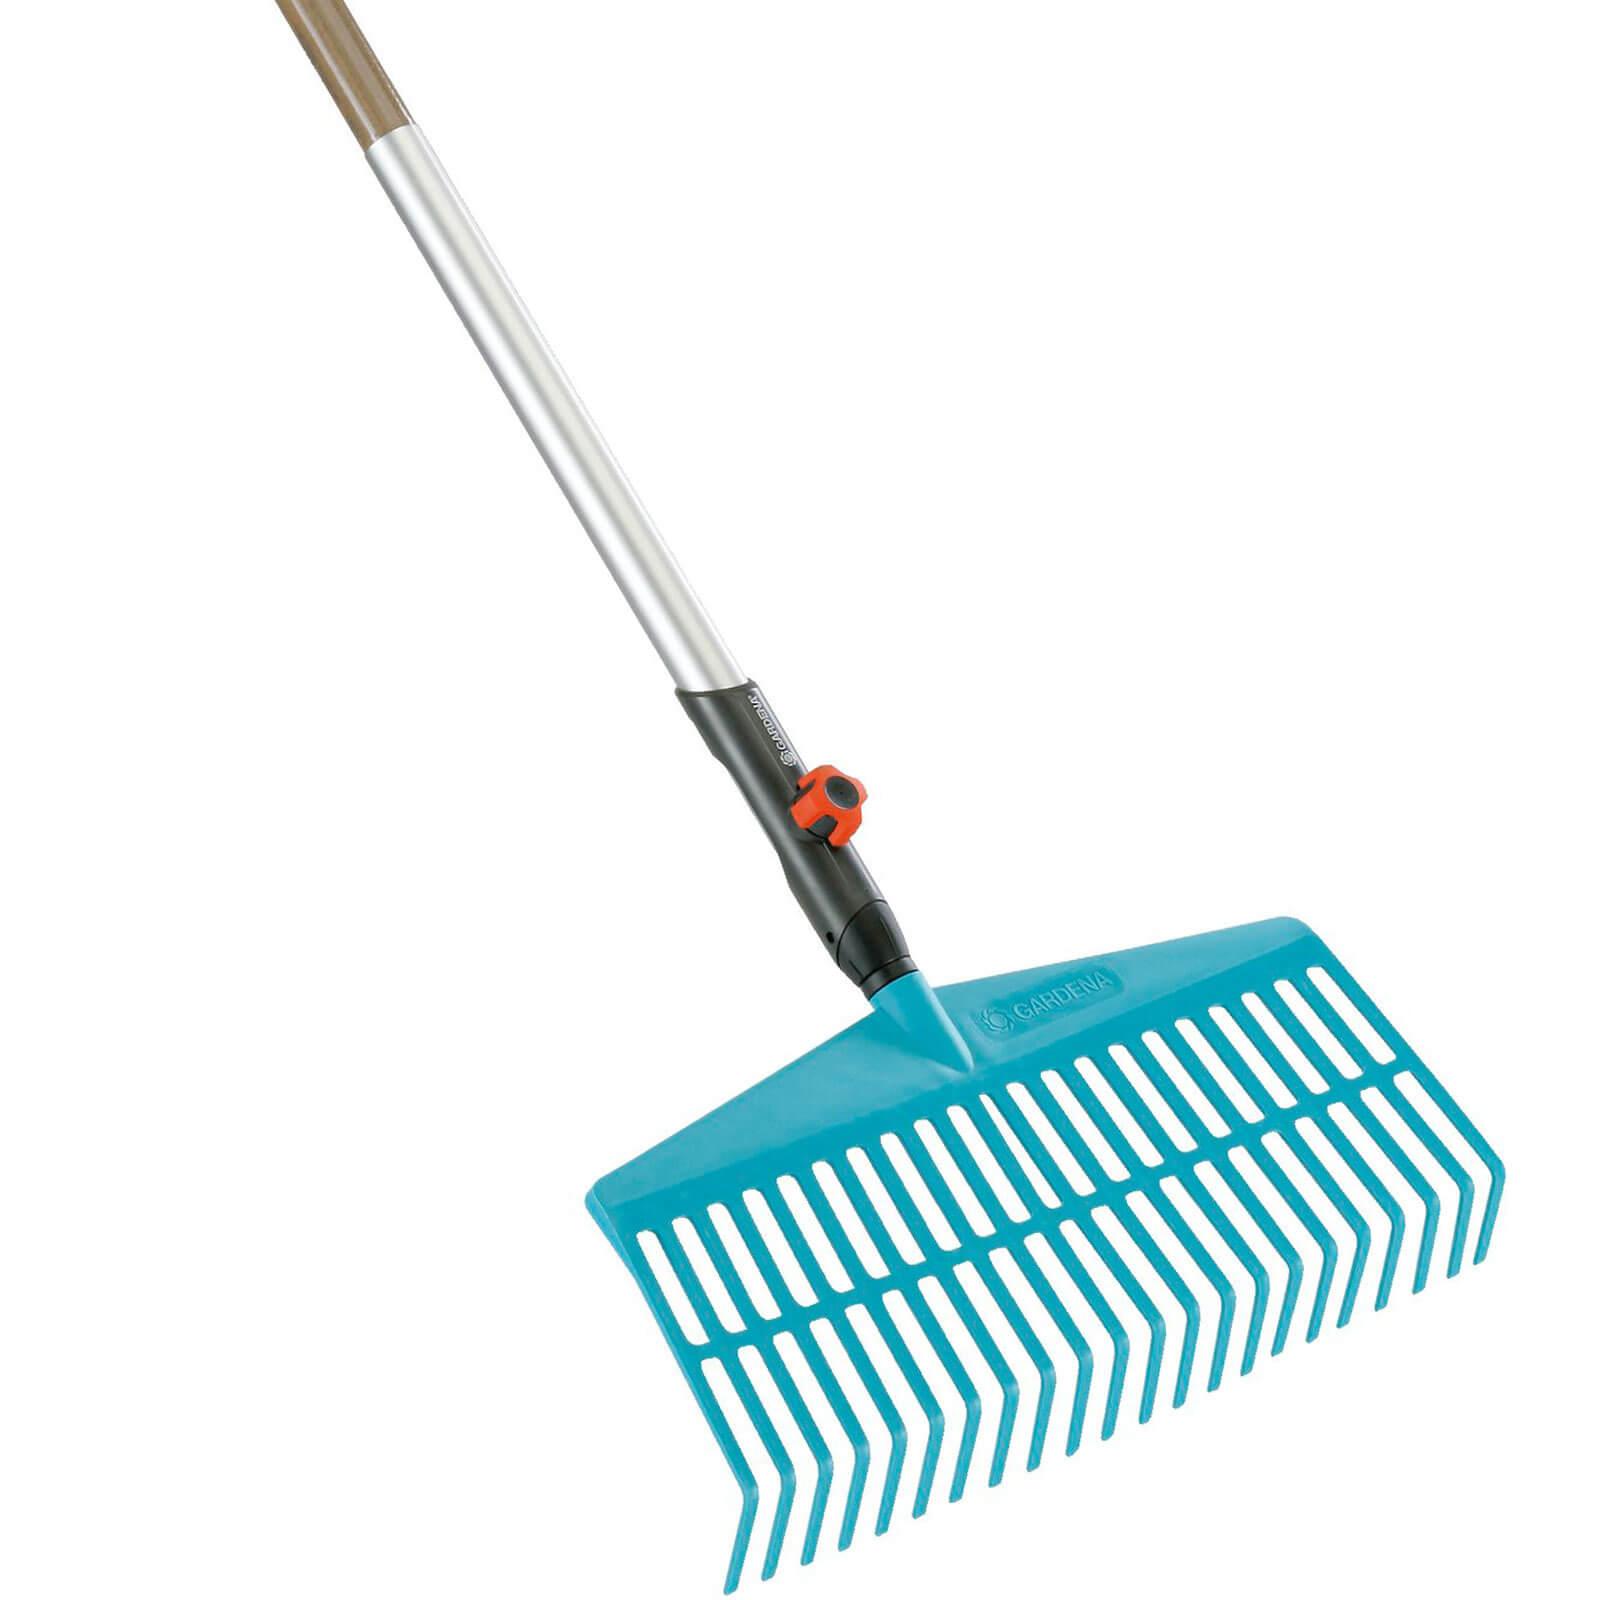 Garden hand tools gardena combisystem fan rake with for Garden tools hand rake